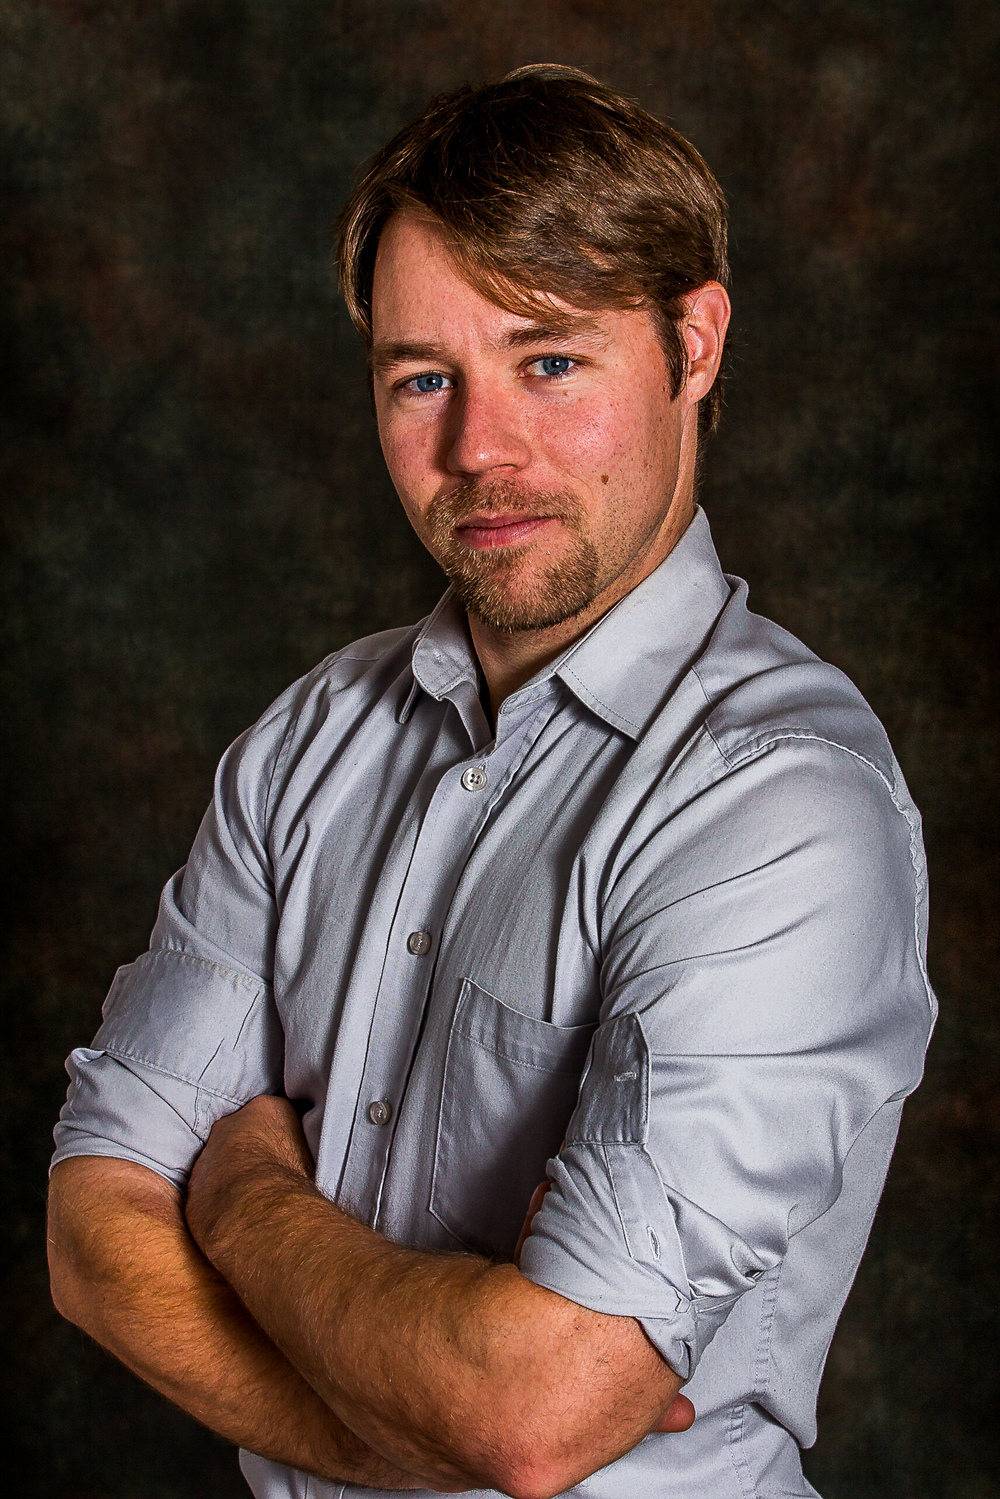 Actor Handsome Headshot